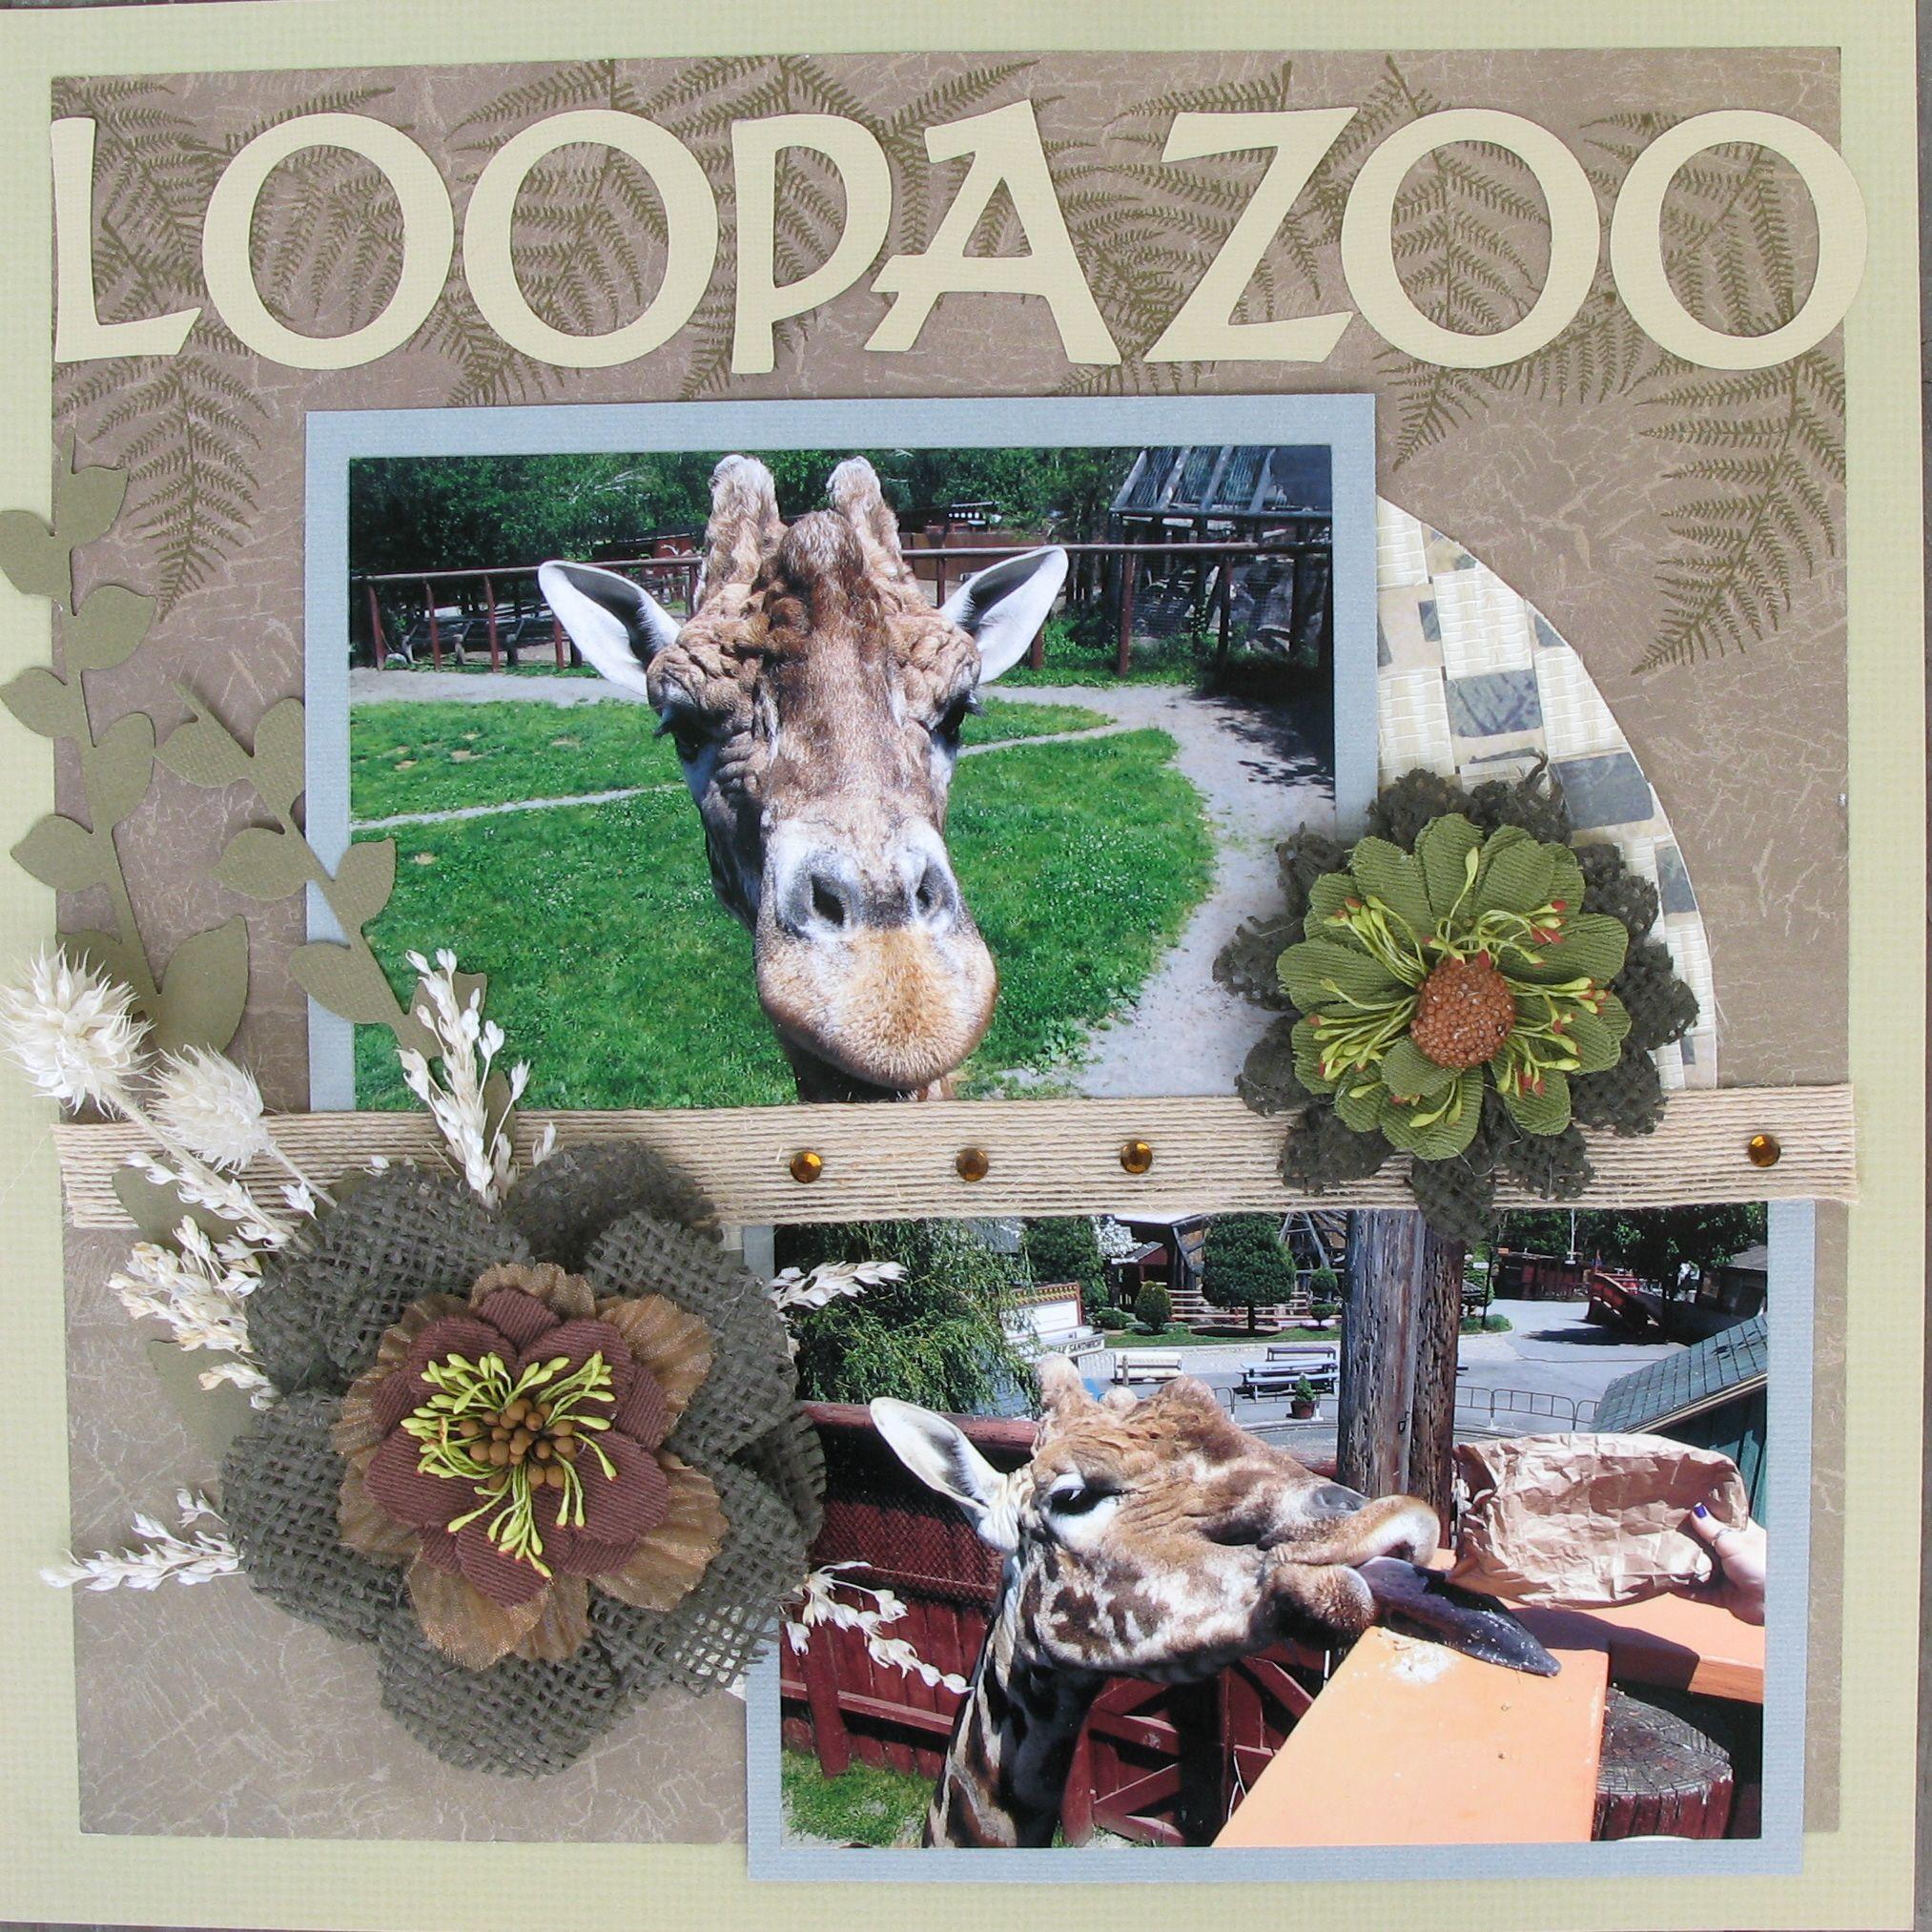 Zoo animal scrapbook ideas - Loopa Zoo Scrapbook Com Animals Outdoors